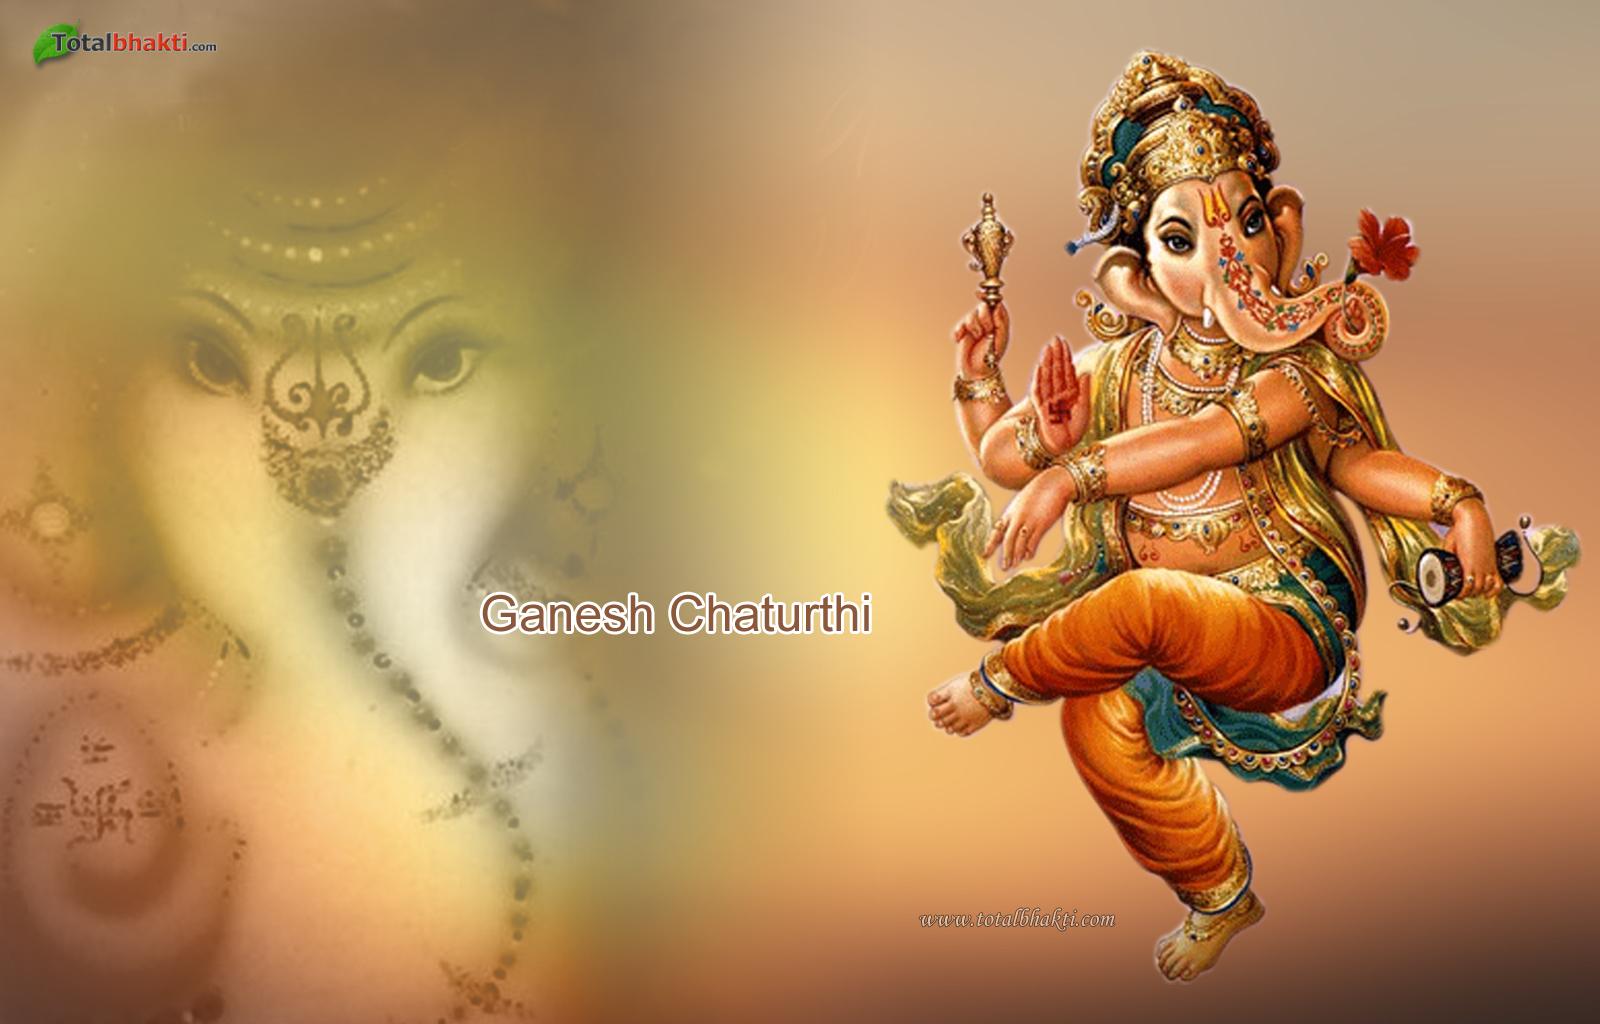 God Ganesh Hd Wallpaper Bhagwan Ji Help Me Ganesh Chaturthi 2013 Ganesh